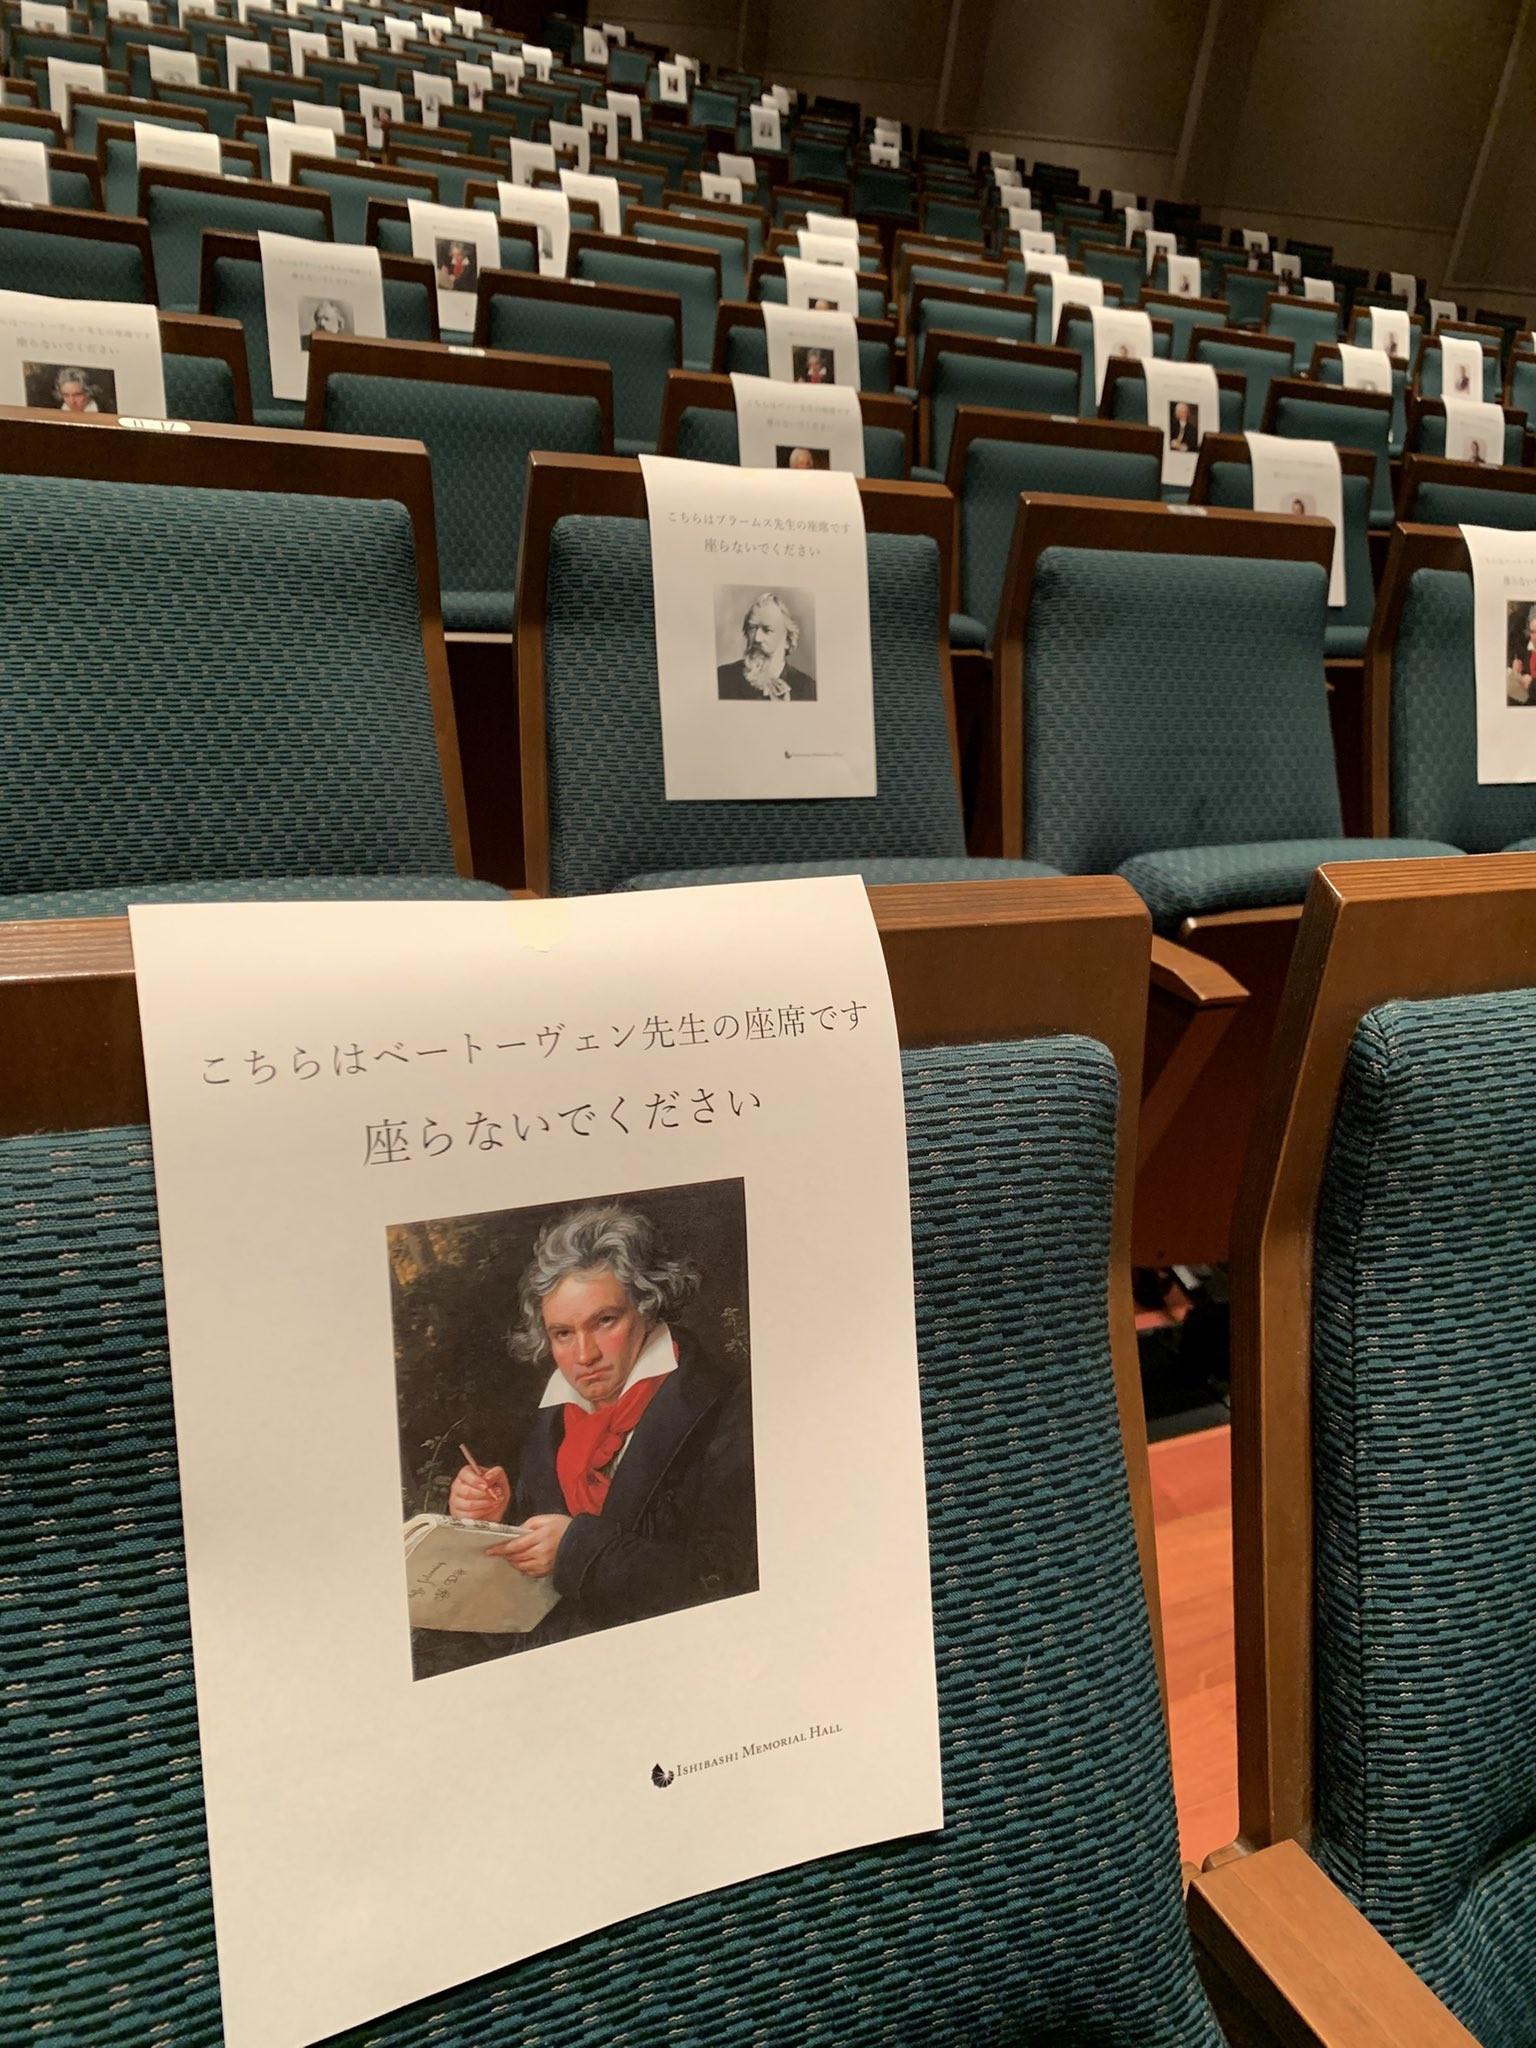 ▲▼ 坐滿偉人的觀眾席 。(圖/翻攝自Twitter/@hall_okaphil/@HinaMaeda_vn)